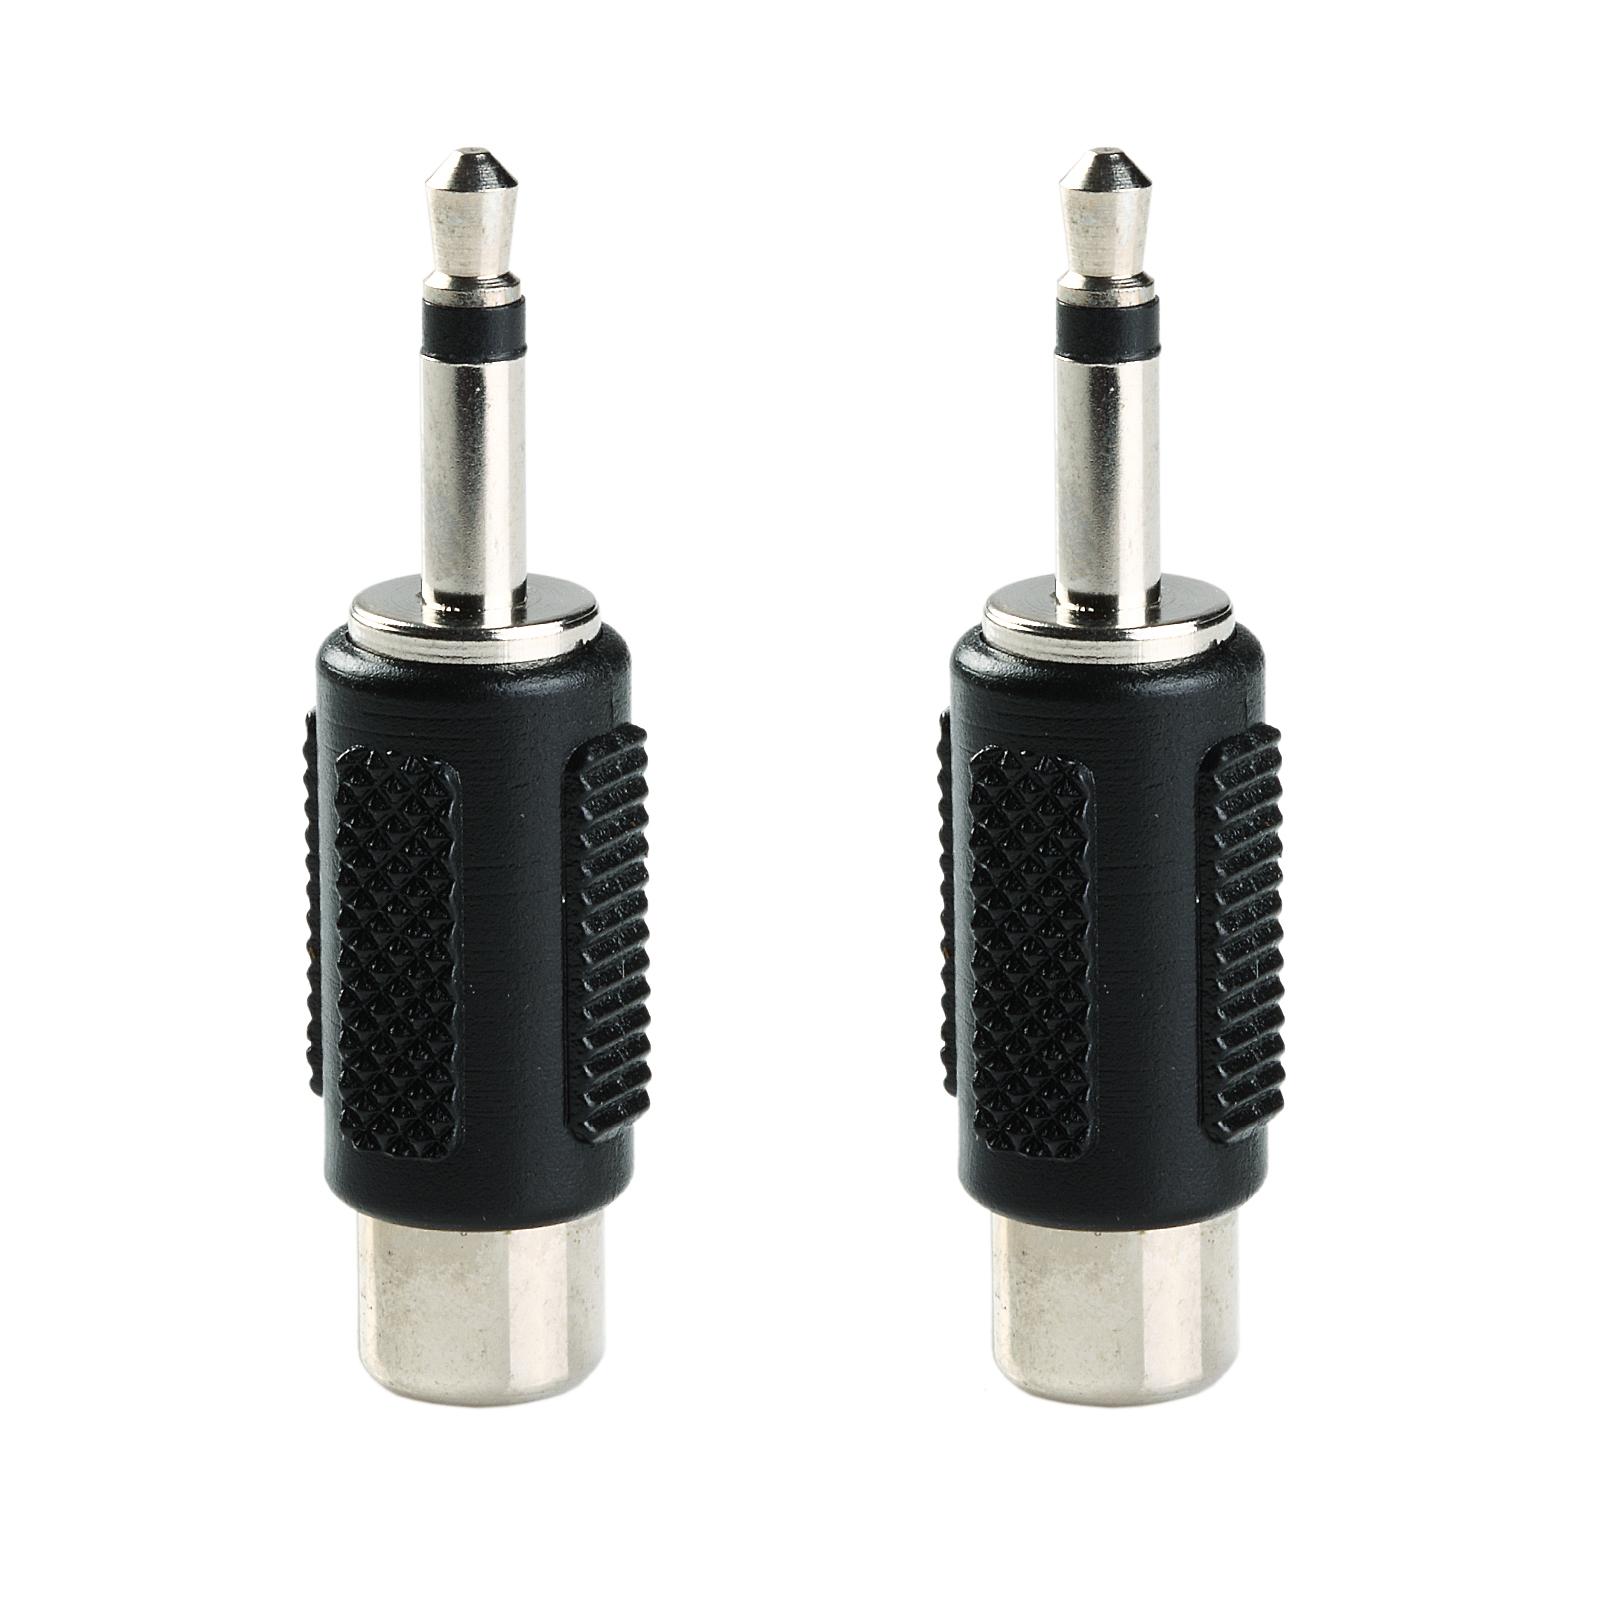 1 8 35mm Male Mono Phone Plug To Female Rca Phono Jack Adapter 2 Wiring 2pcs